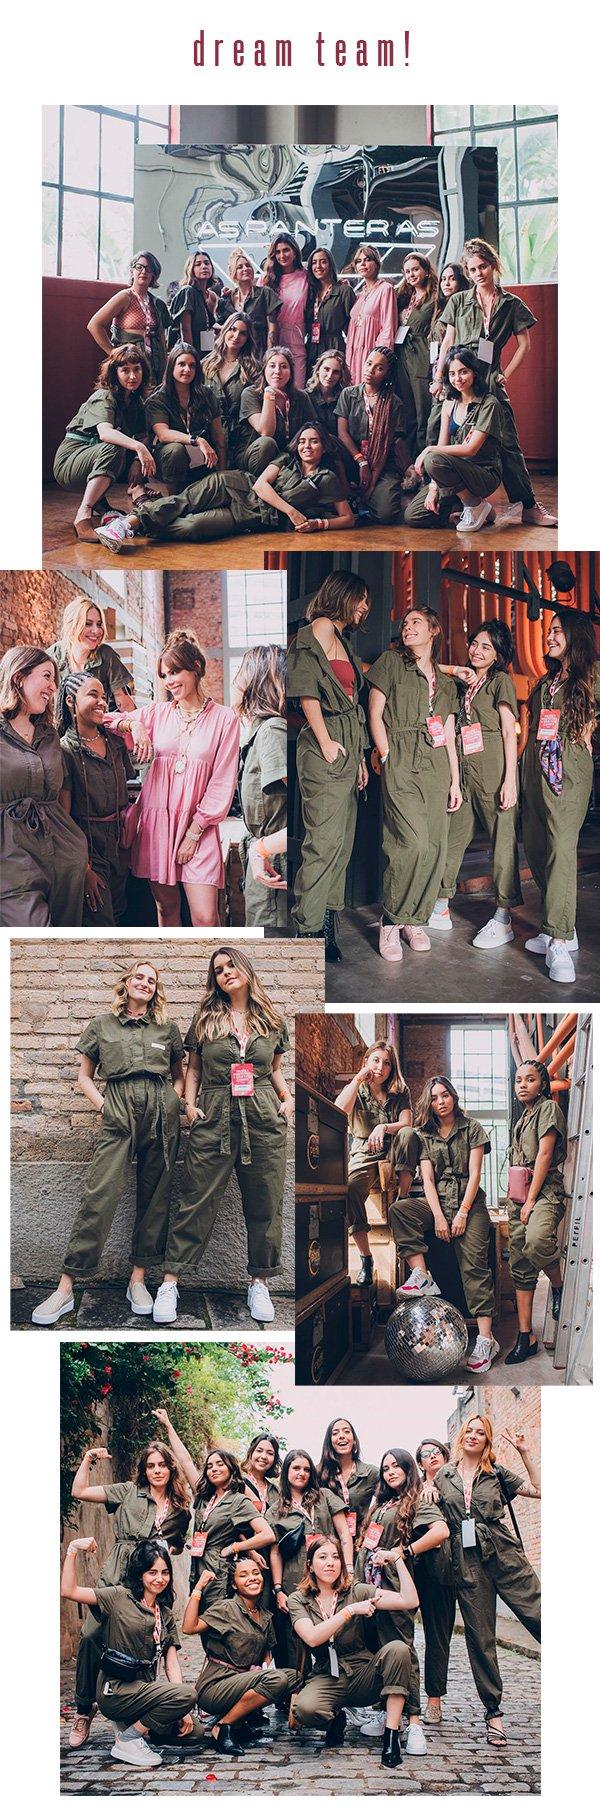 push - evento - look - meninas - macacao